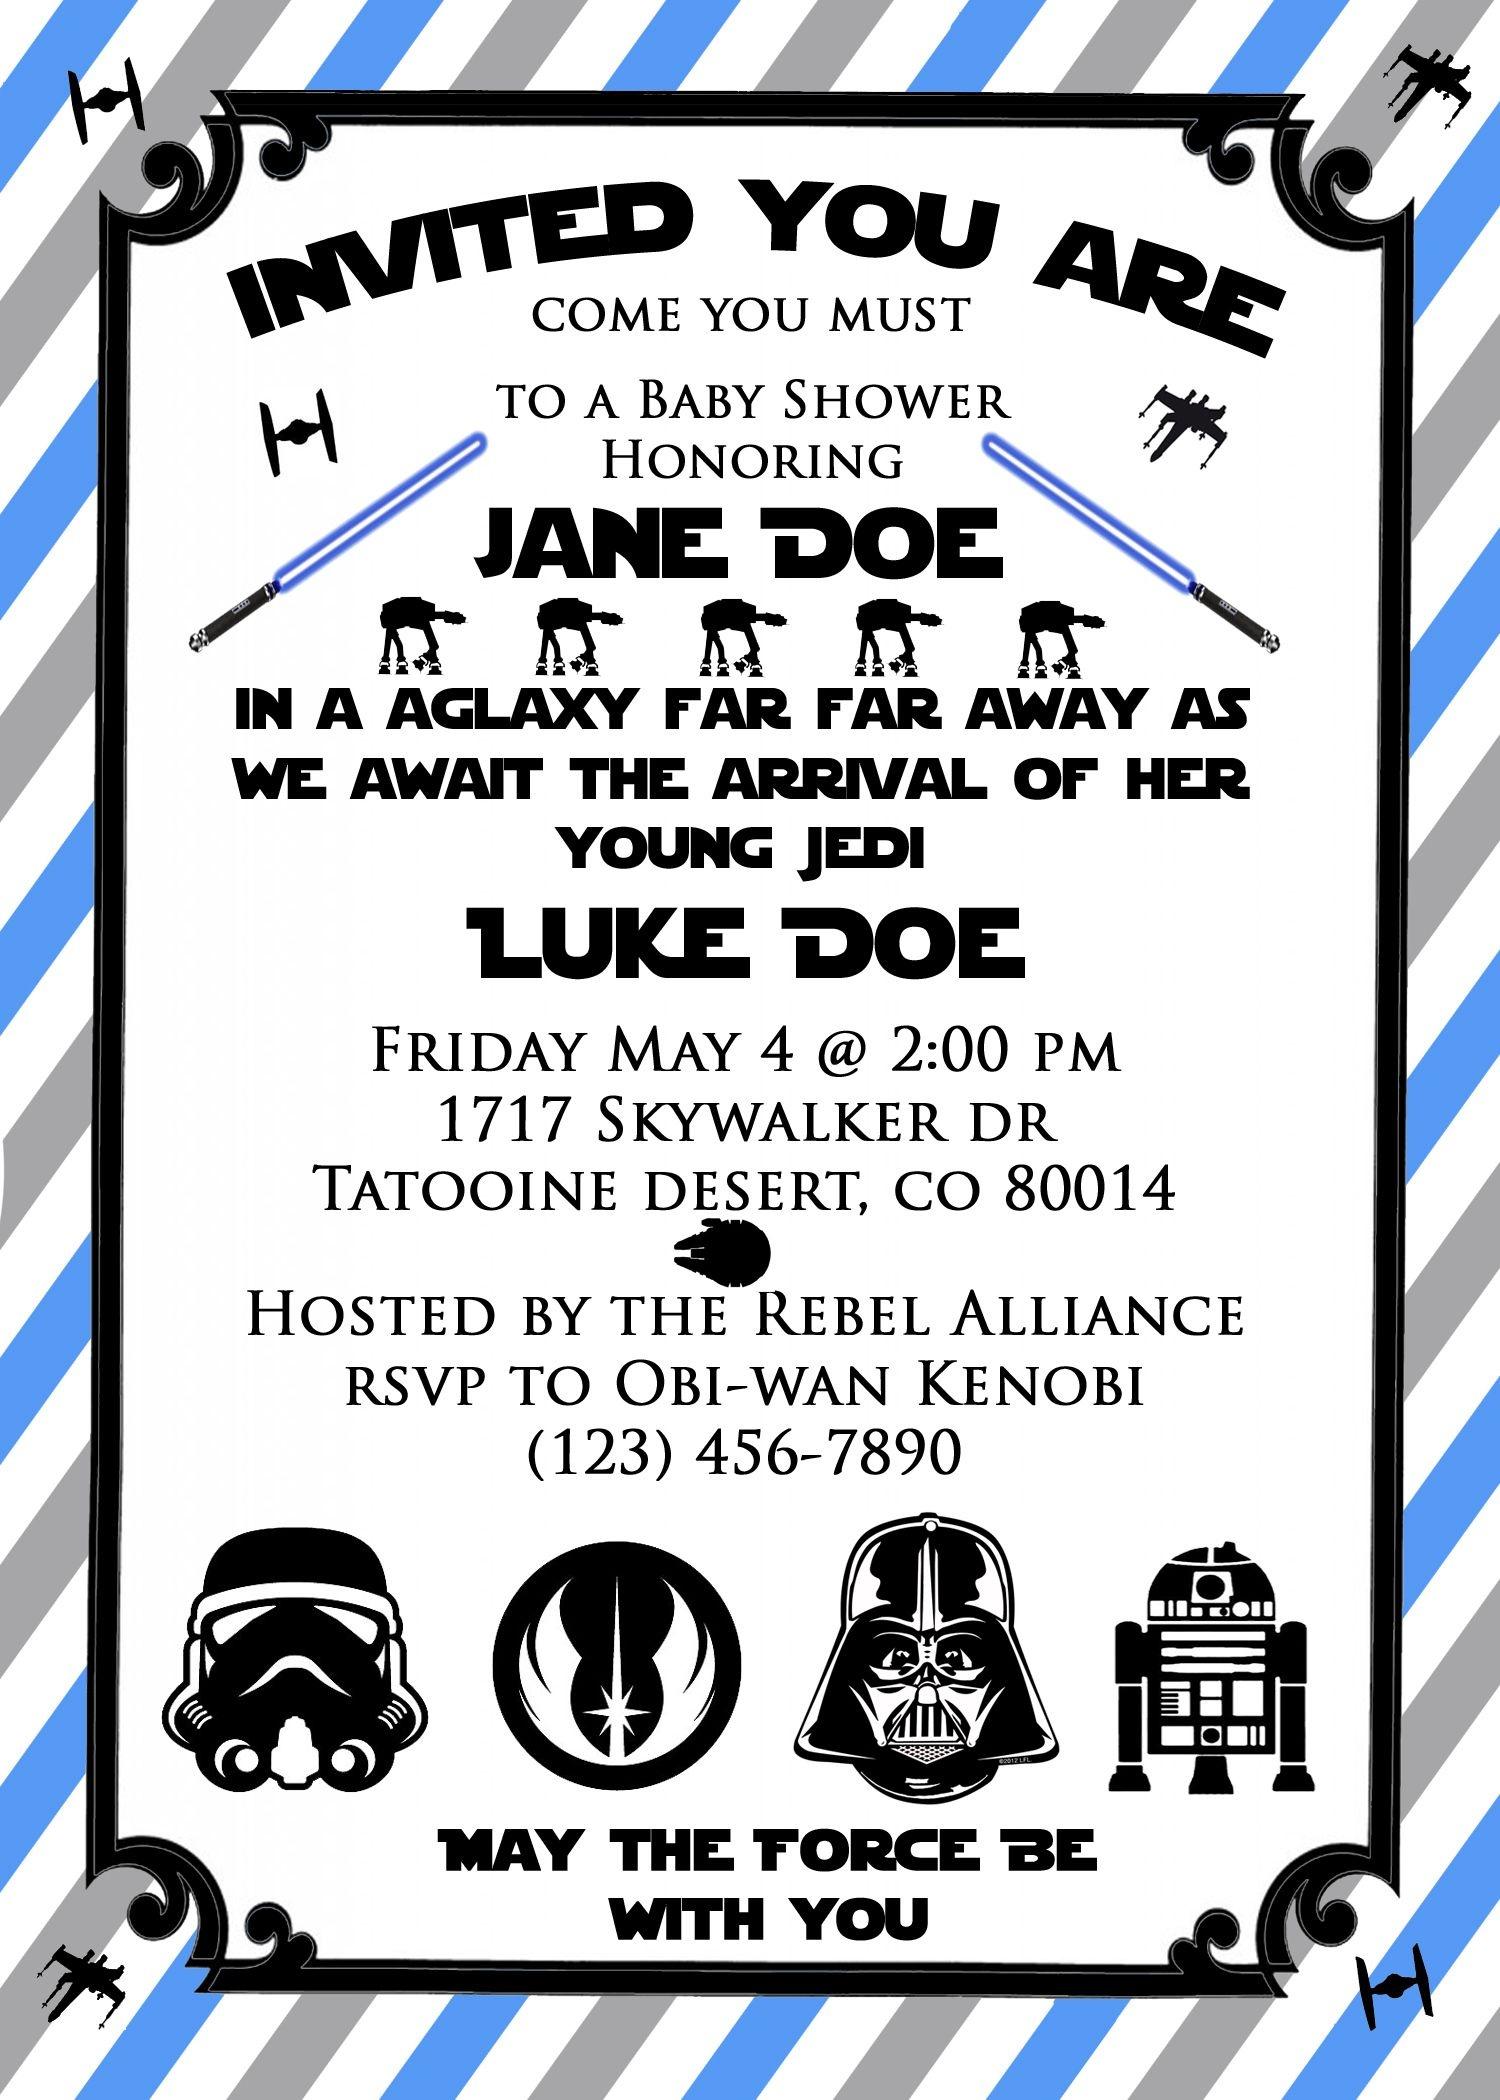 Star Wars Baby Shower Invite! So Cute For A Star Wars Themed Baby - Free Printable Star Wars Baby Shower Invites